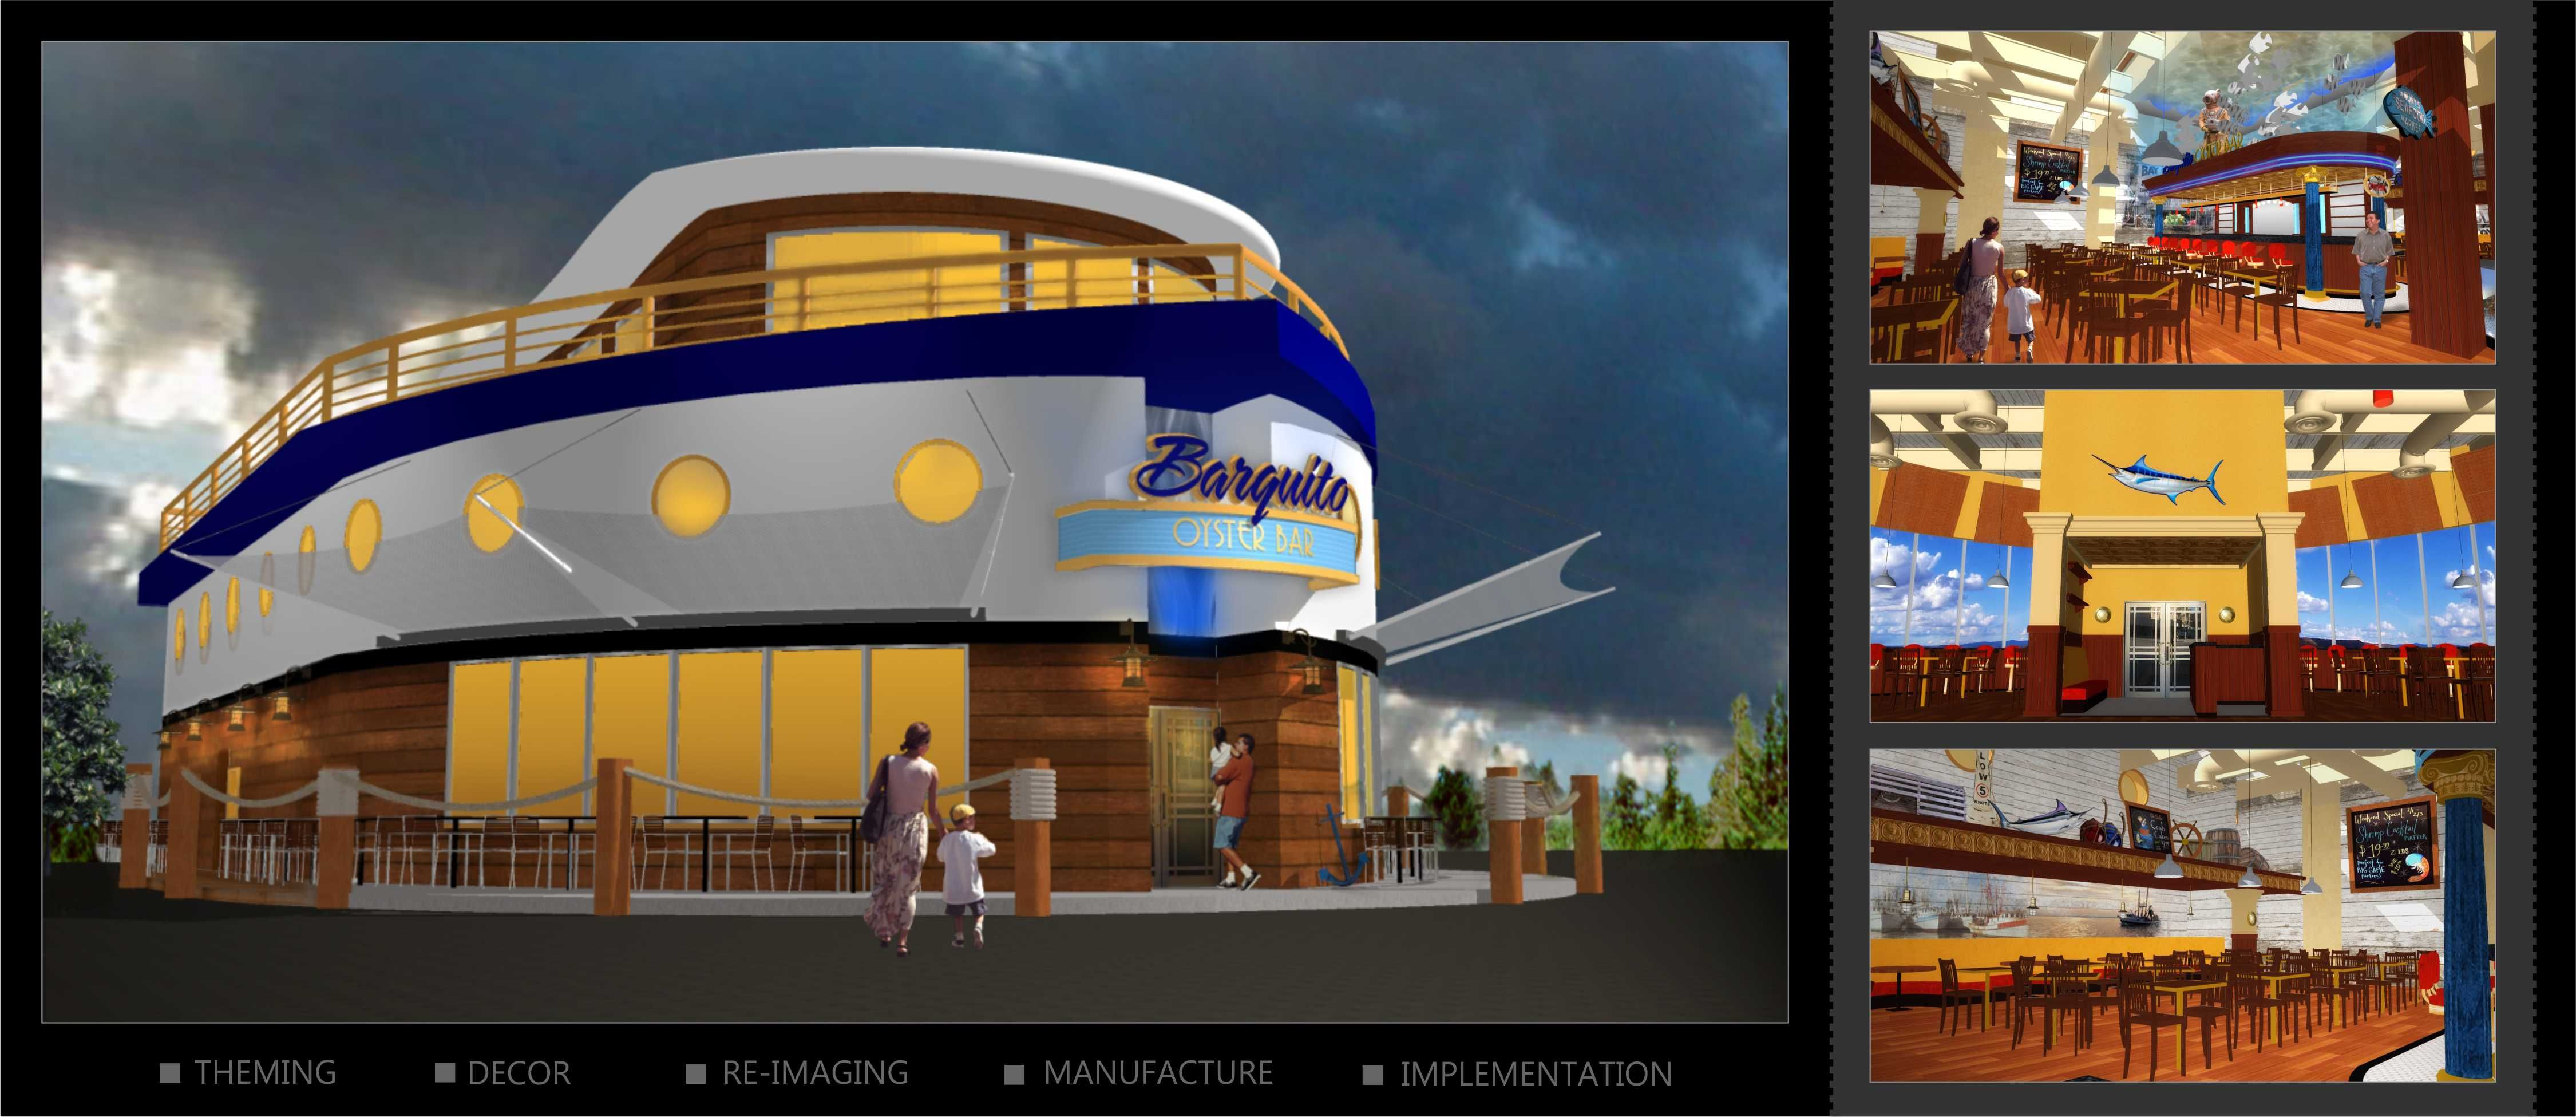 barquitto oyster bar - restaurant design rendering - www.i5design